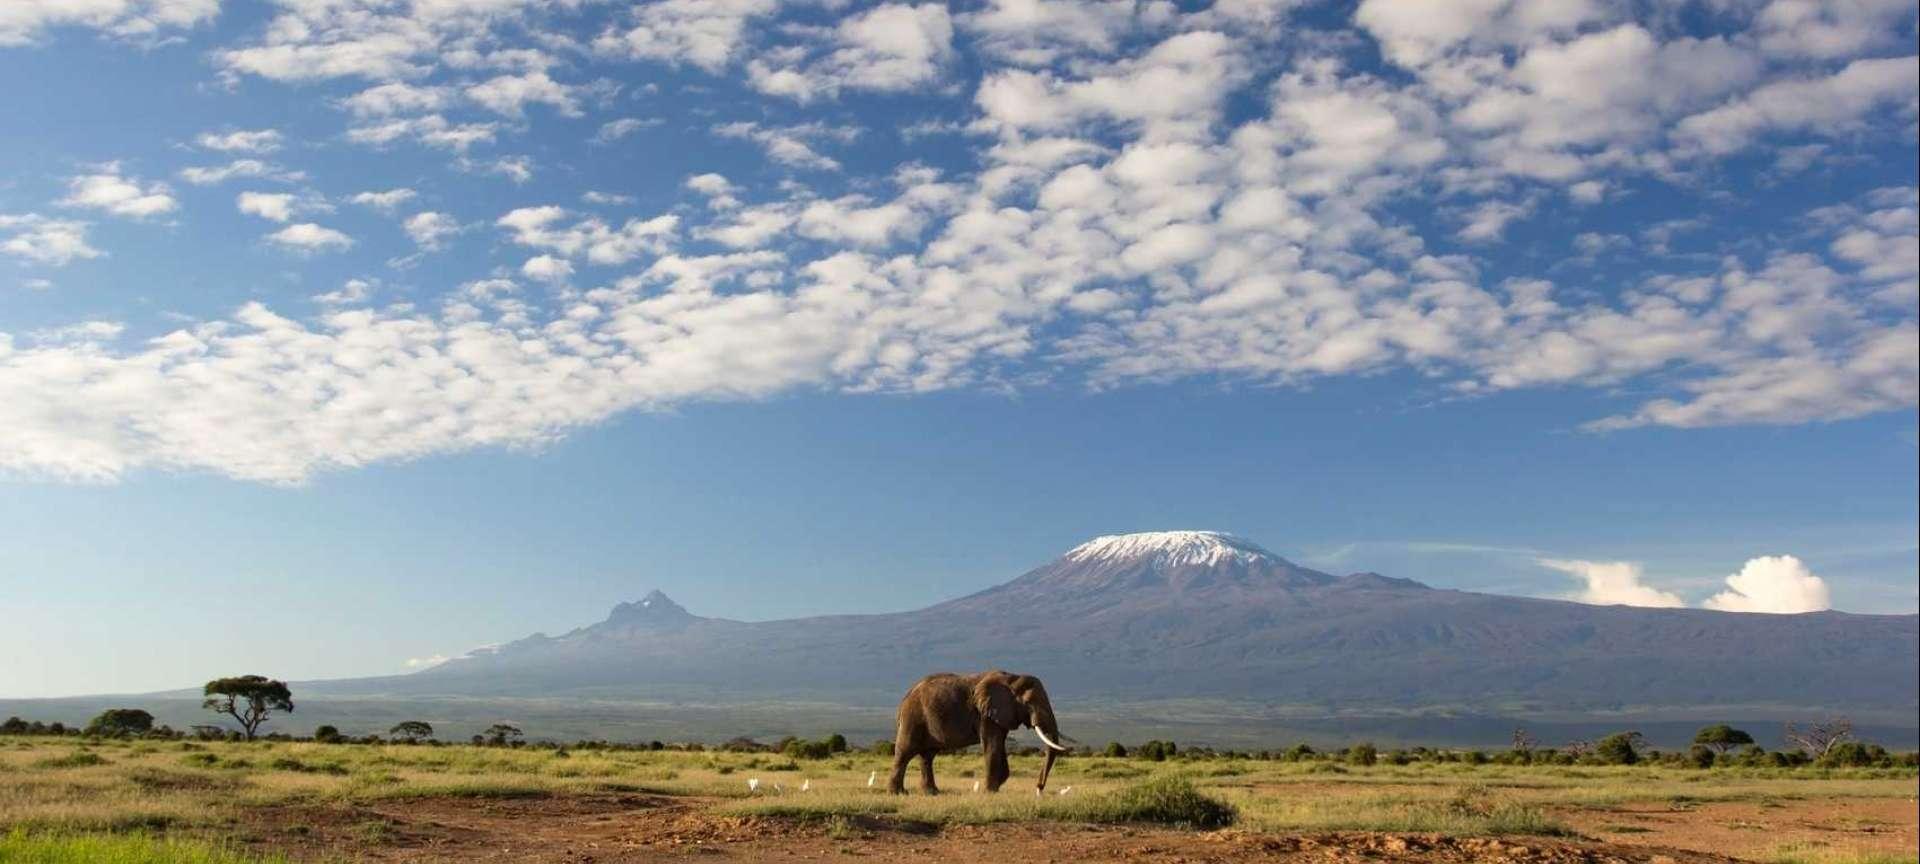 Climbing Mount Kilimanjaro in Tanzania - Africa Wildlife Safaris